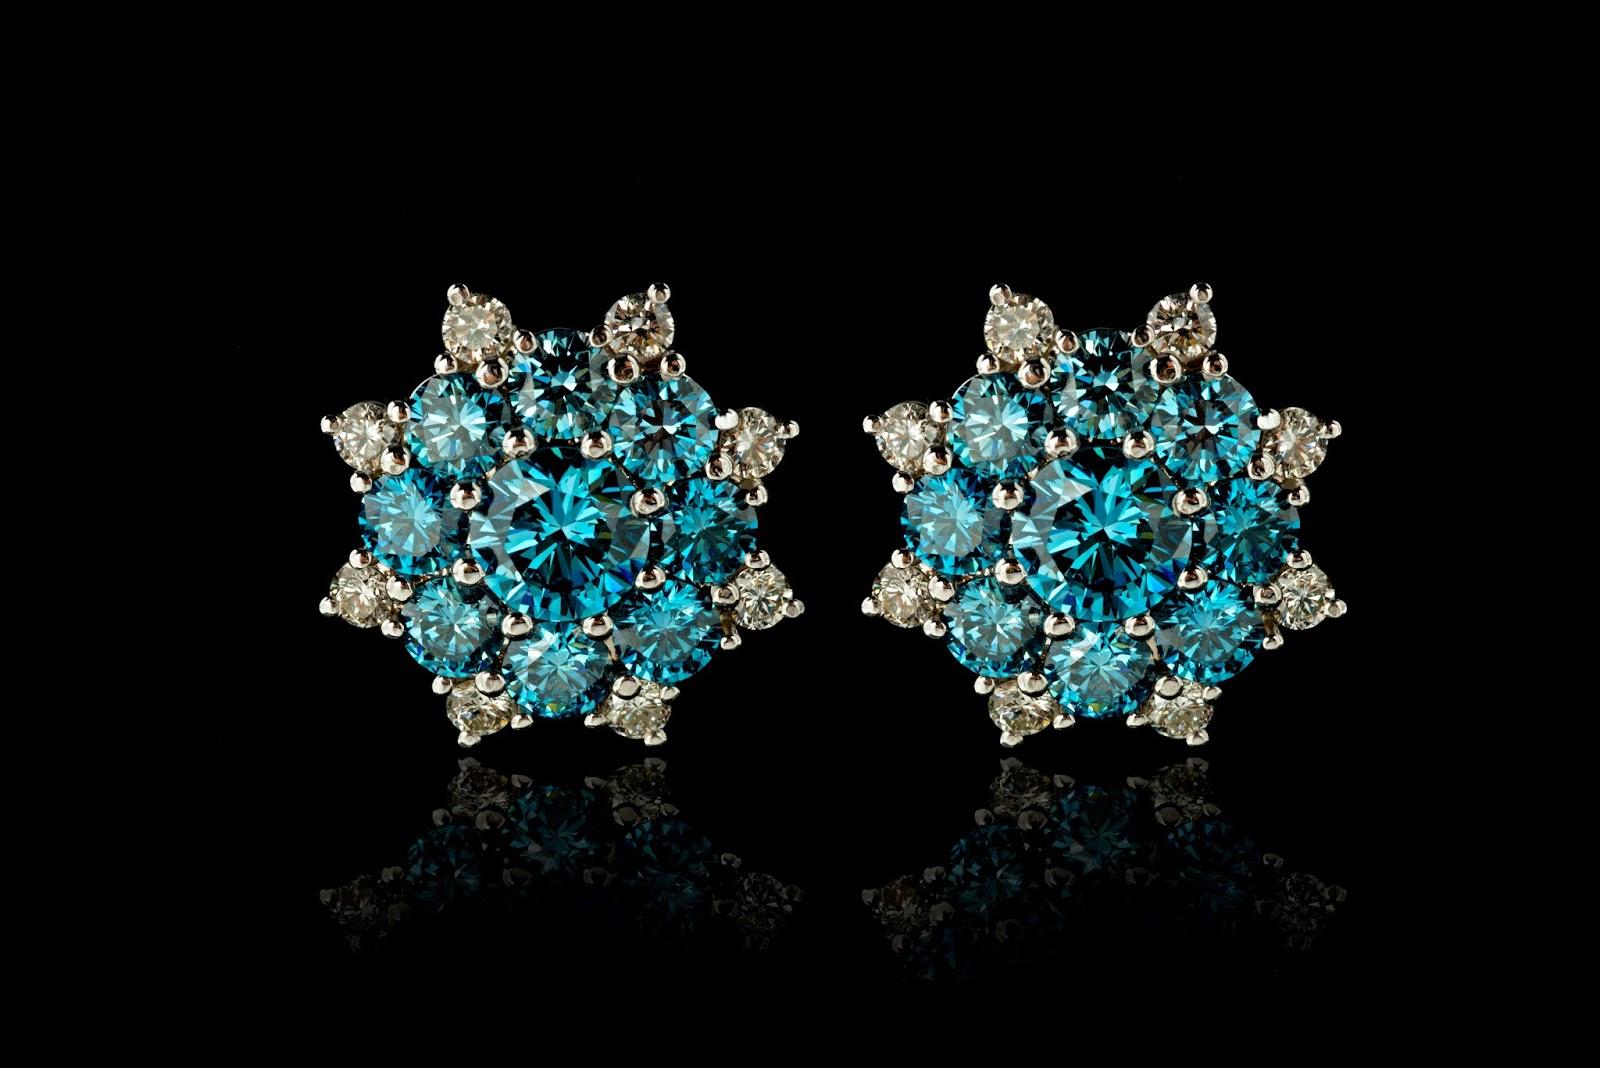 The eureka diamond - Close Up View Of The Blue Diamond Stud Earrings